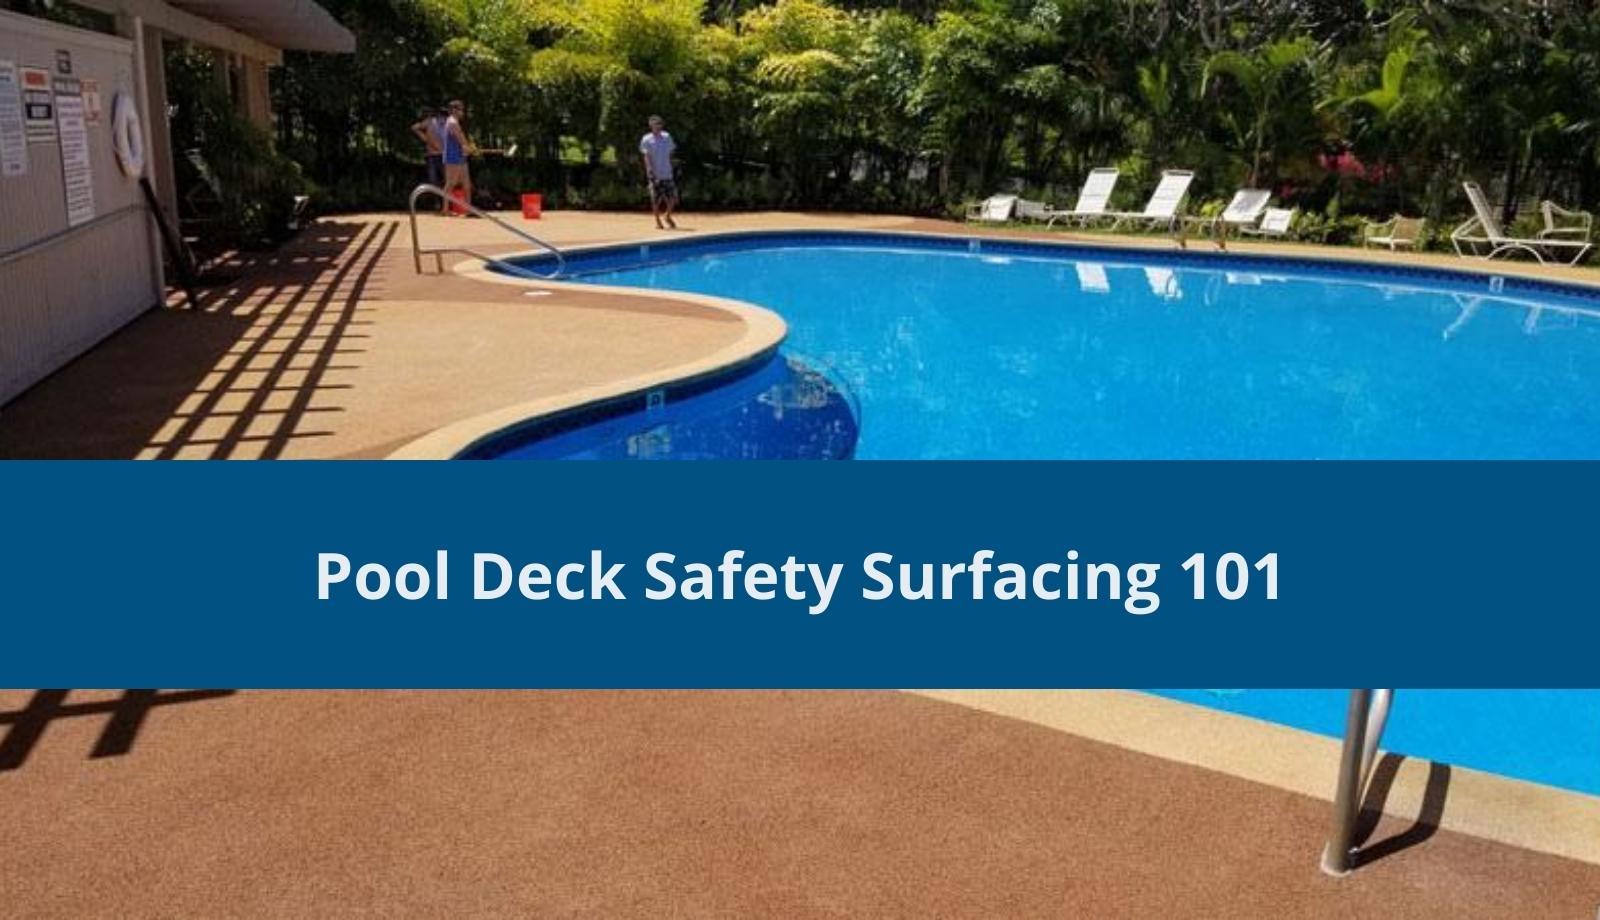 Pool Deck Safety Surfacing 101